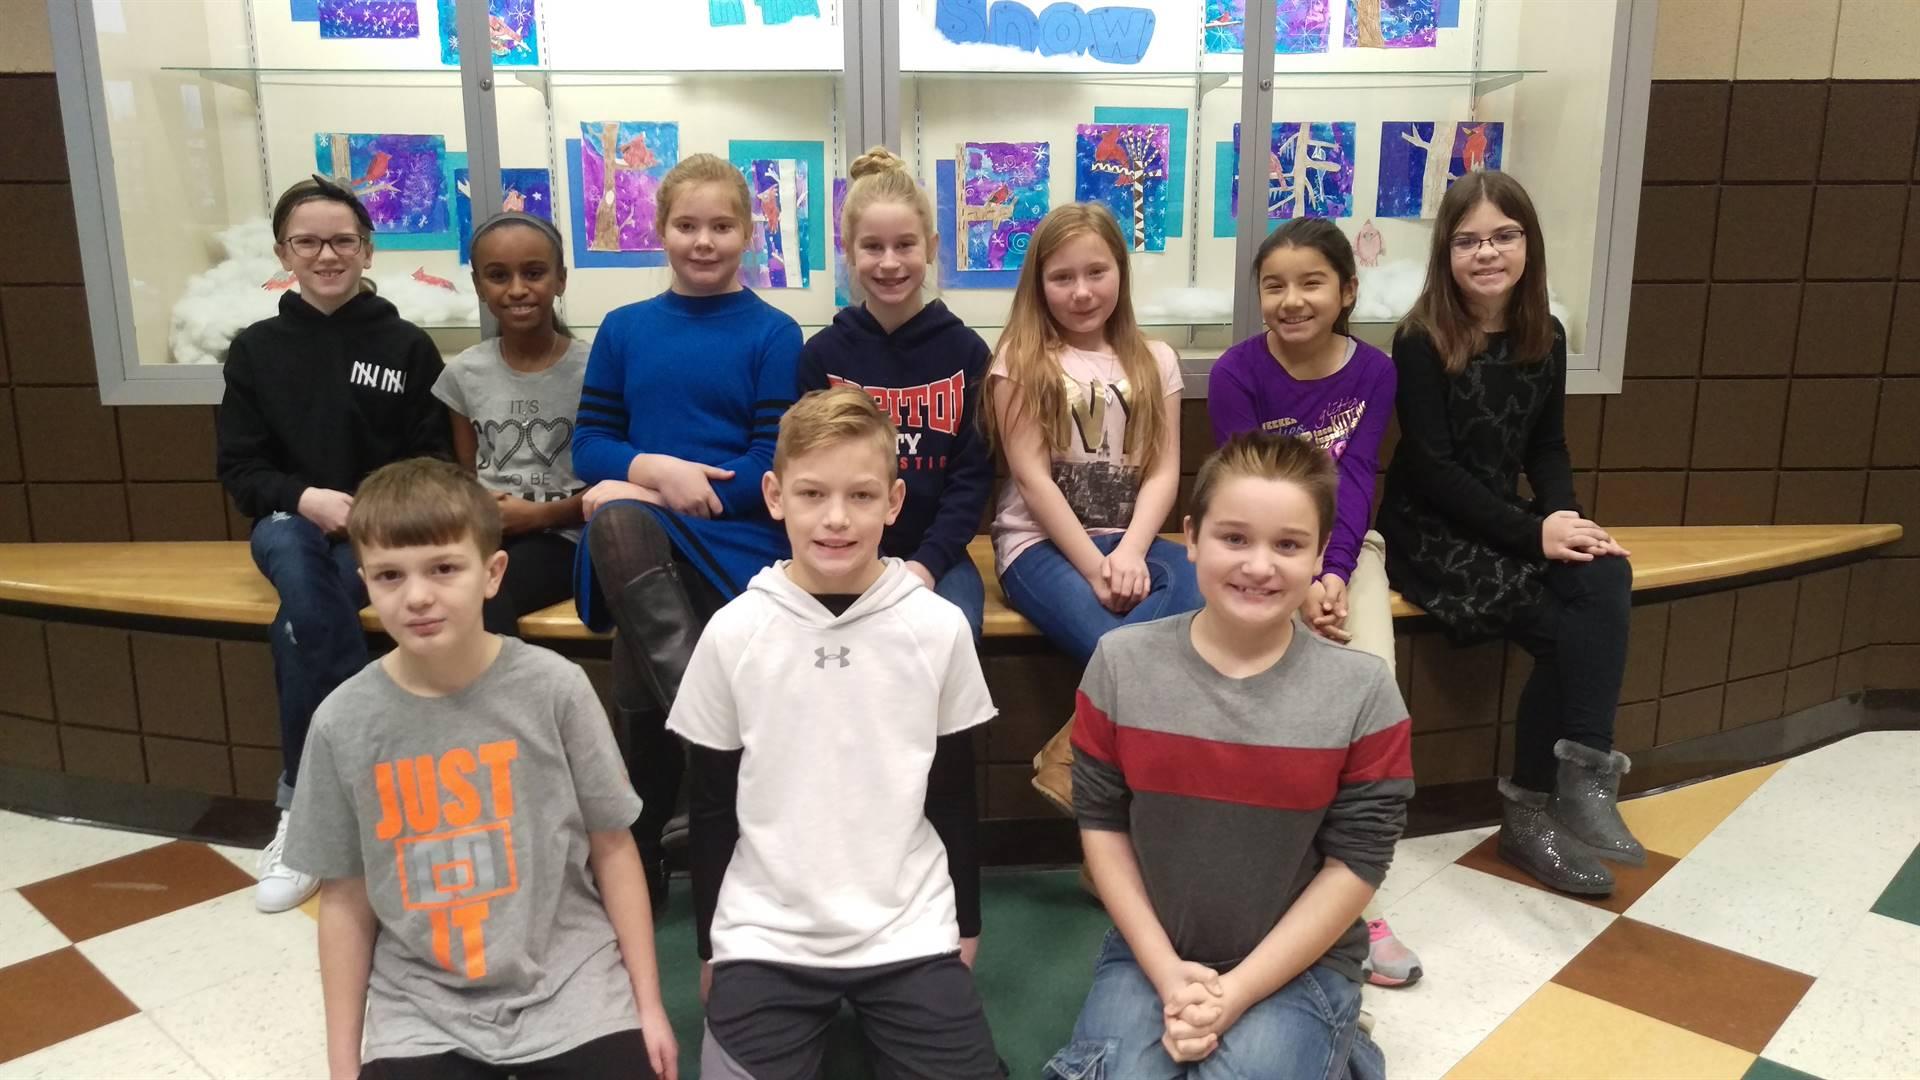 4th grade Principal's Honor Roll Students